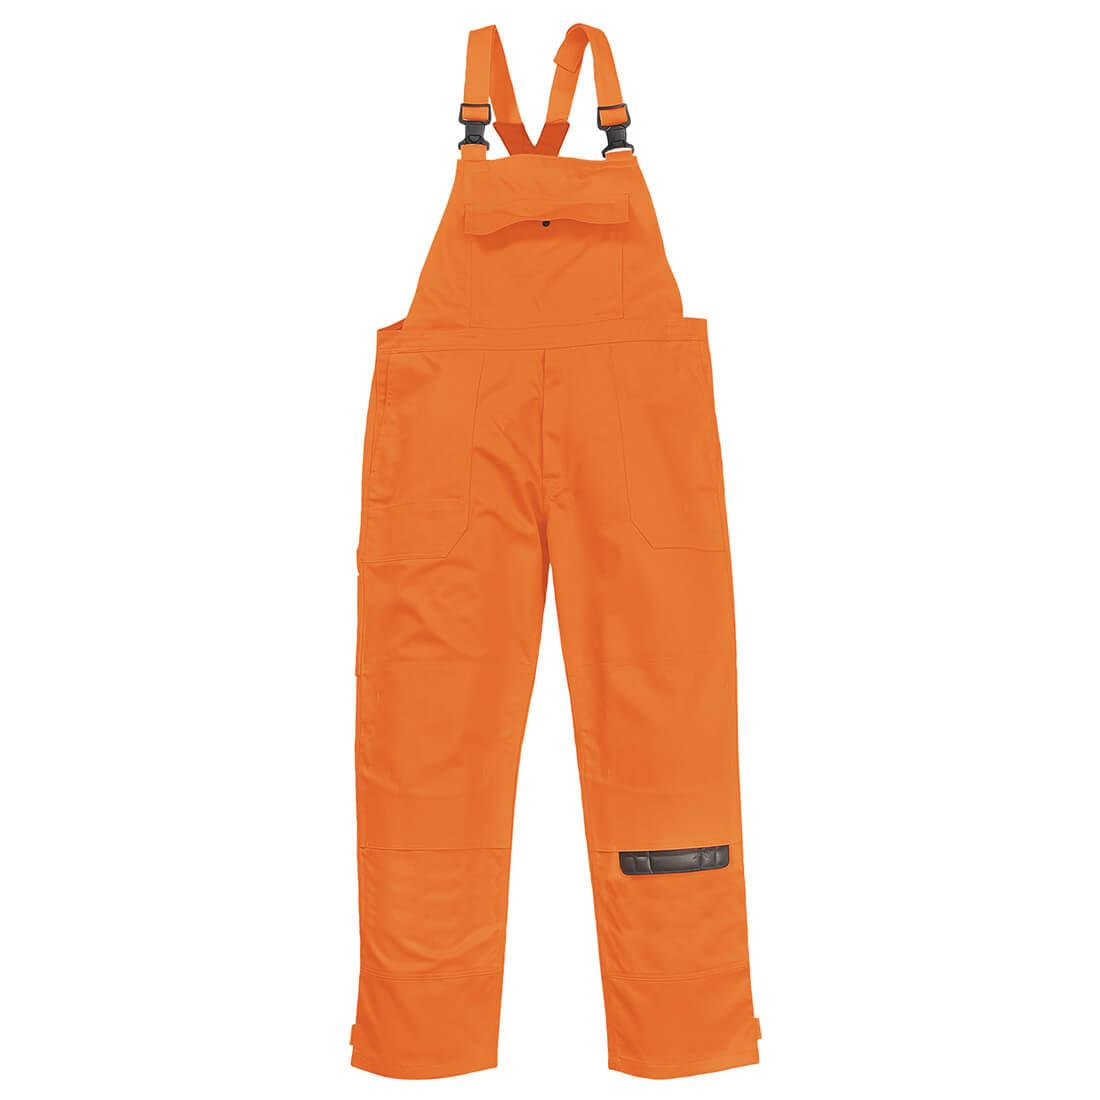 Image of Biz Weld Mens Flame Resistant Bib & Brace Orange 2XL